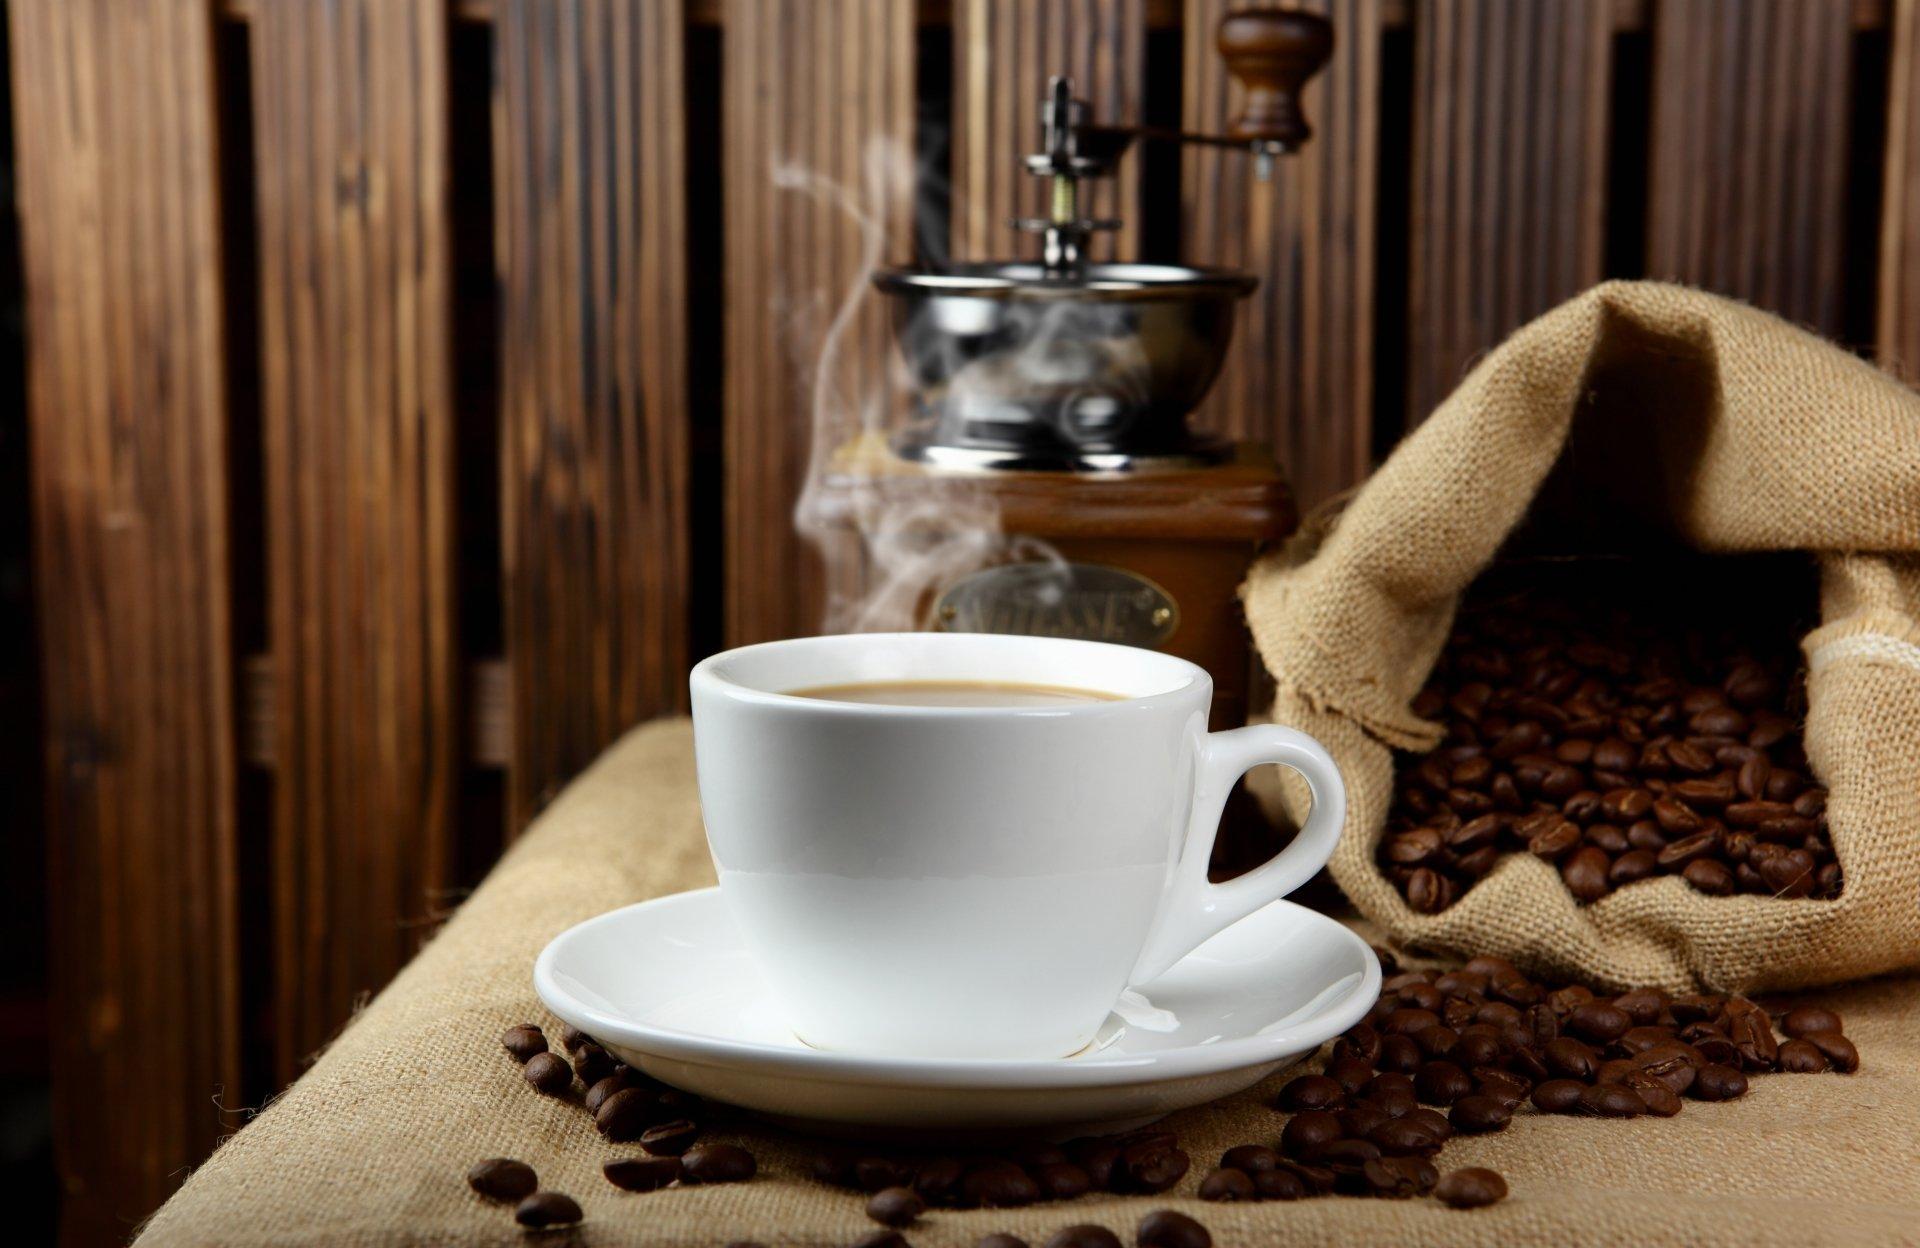 food coffee wallpaper - photo #10